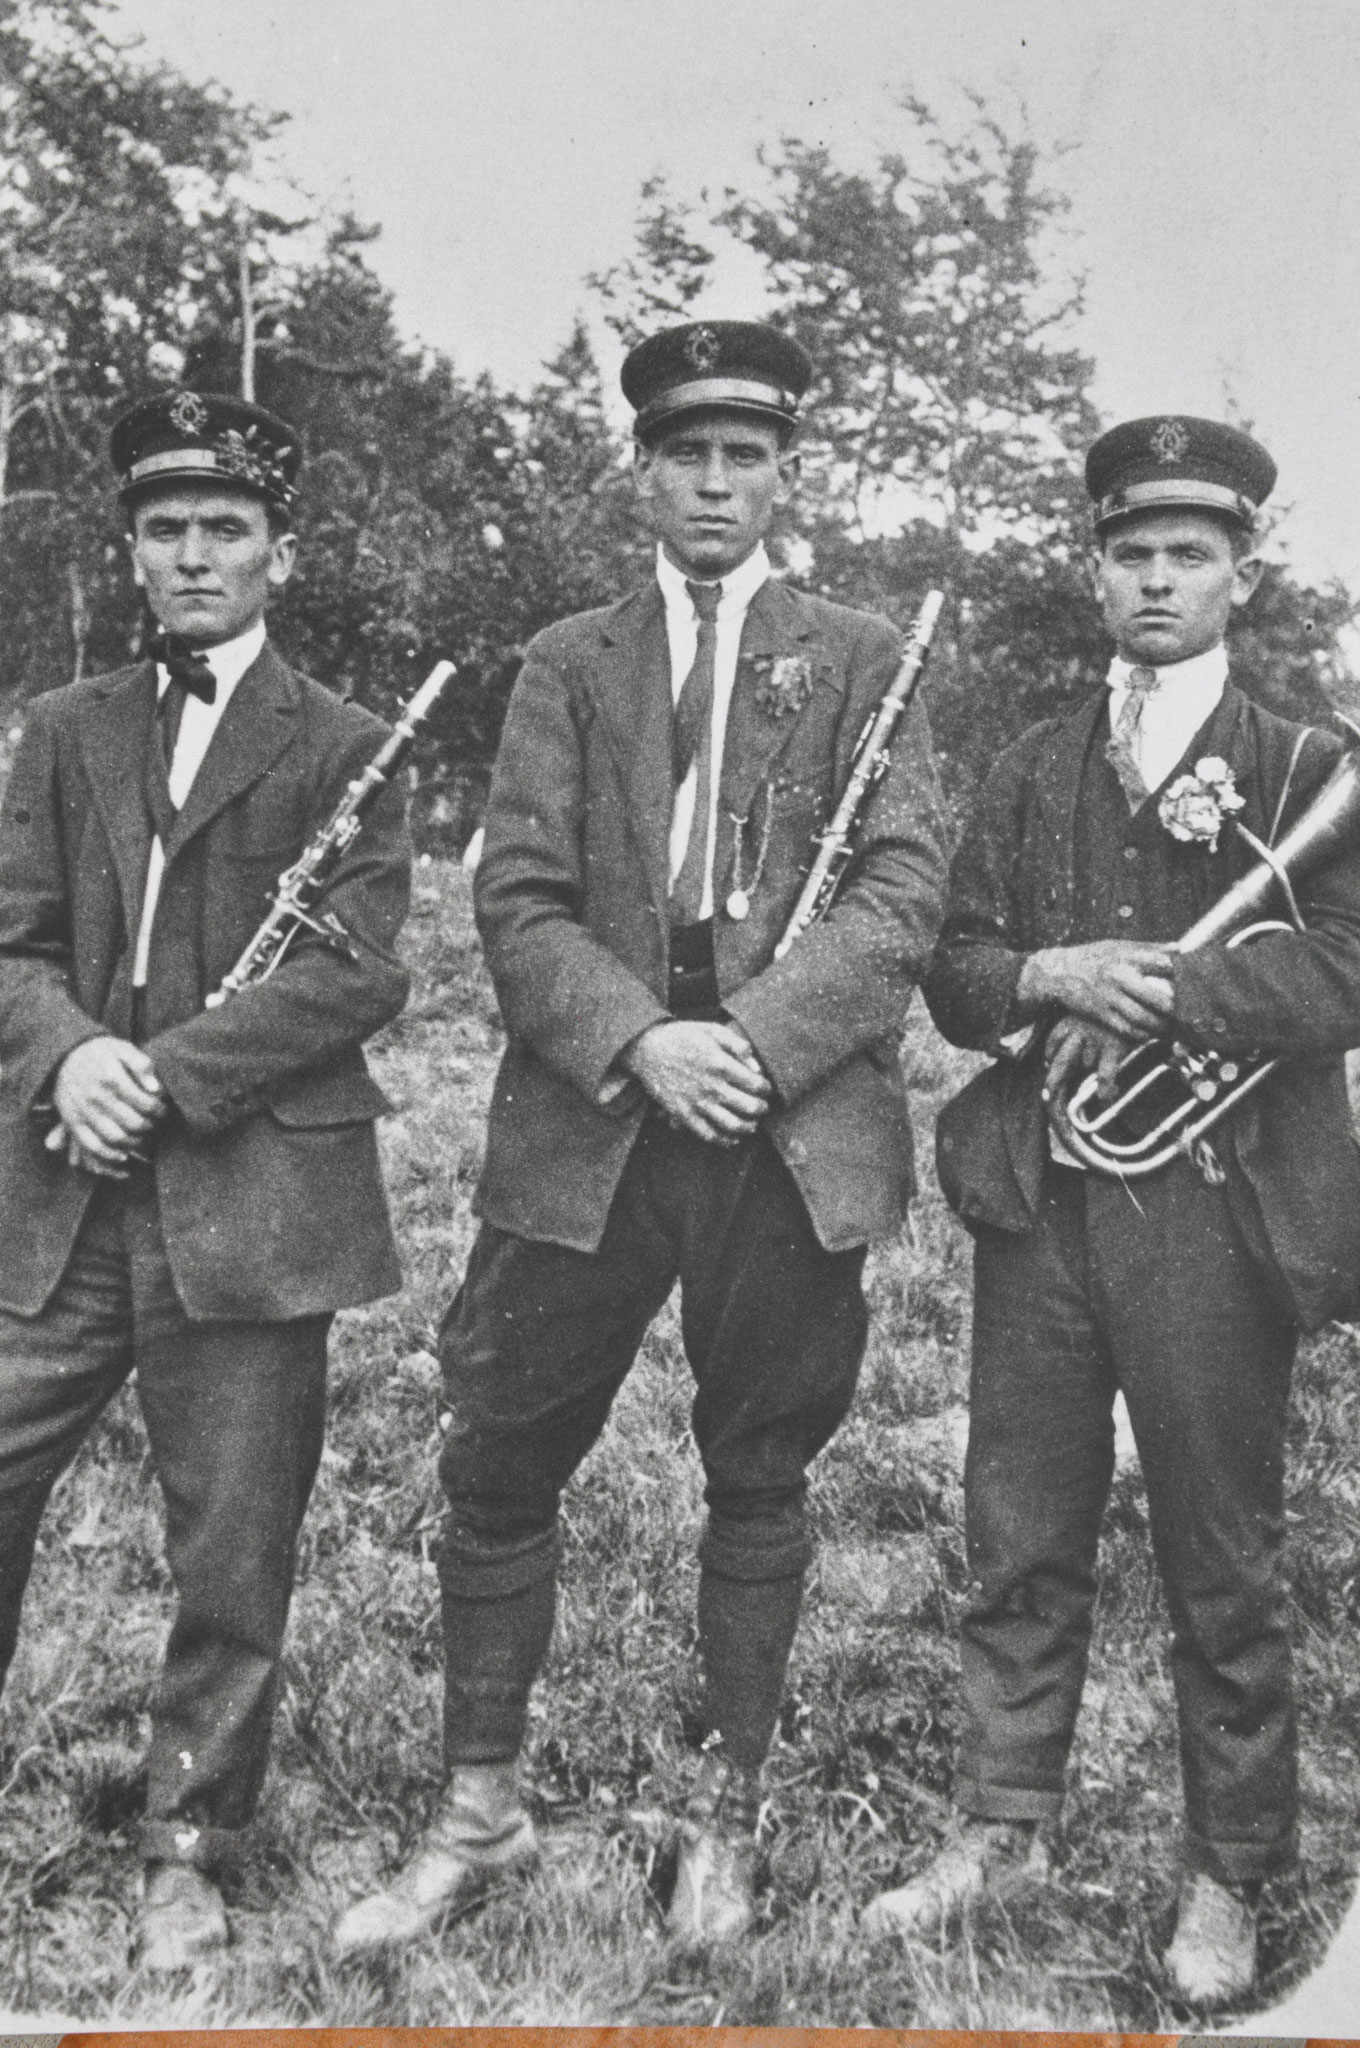 1922 Festa sul Monte Melino